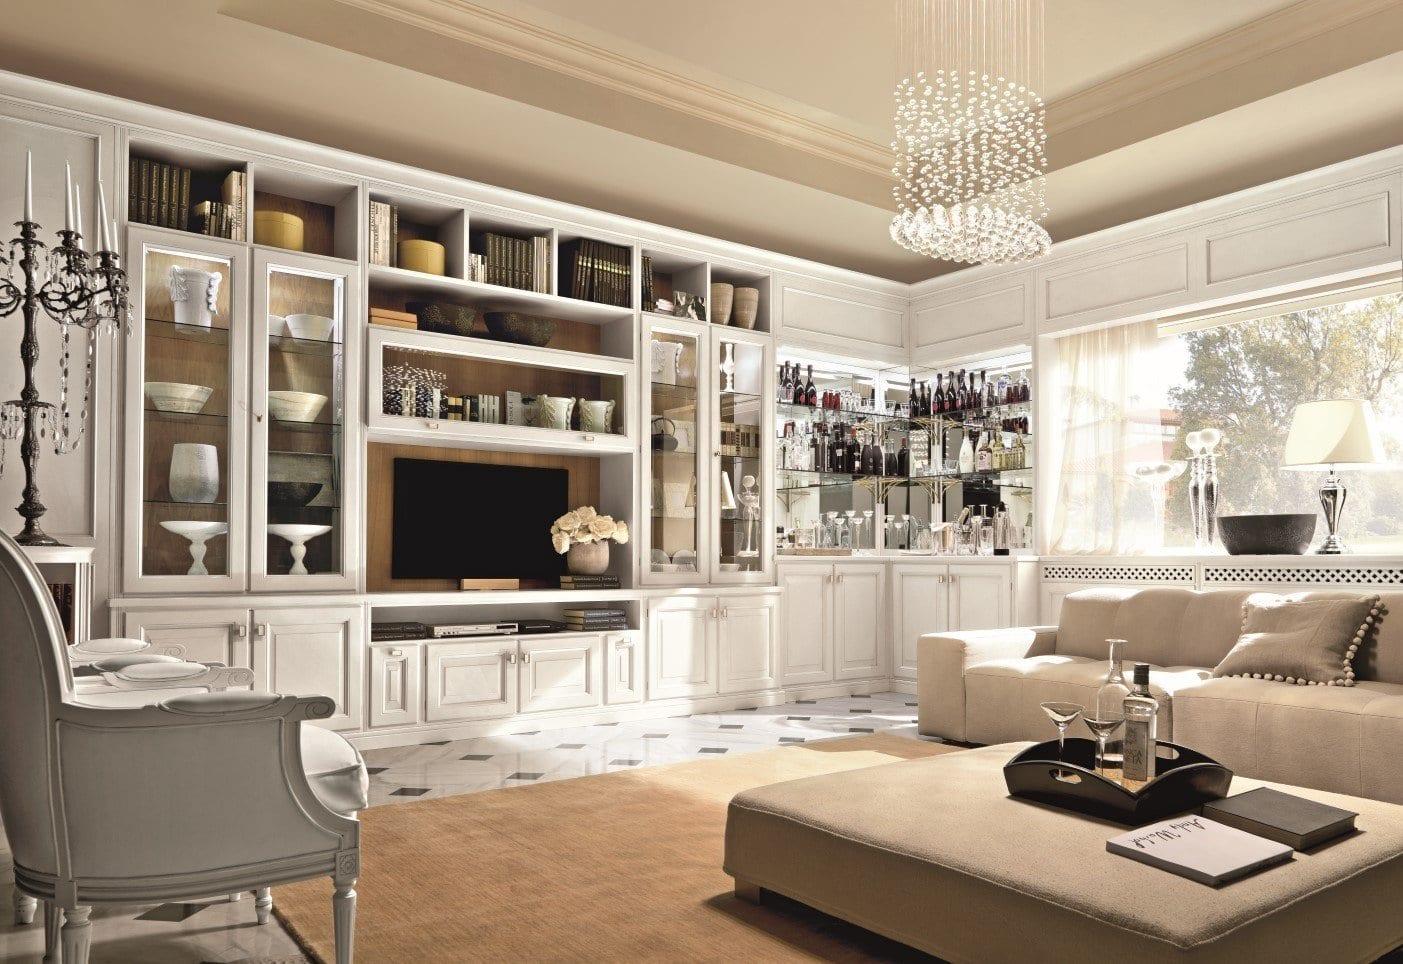 cambridge-ma-residential-renovation-companies-009